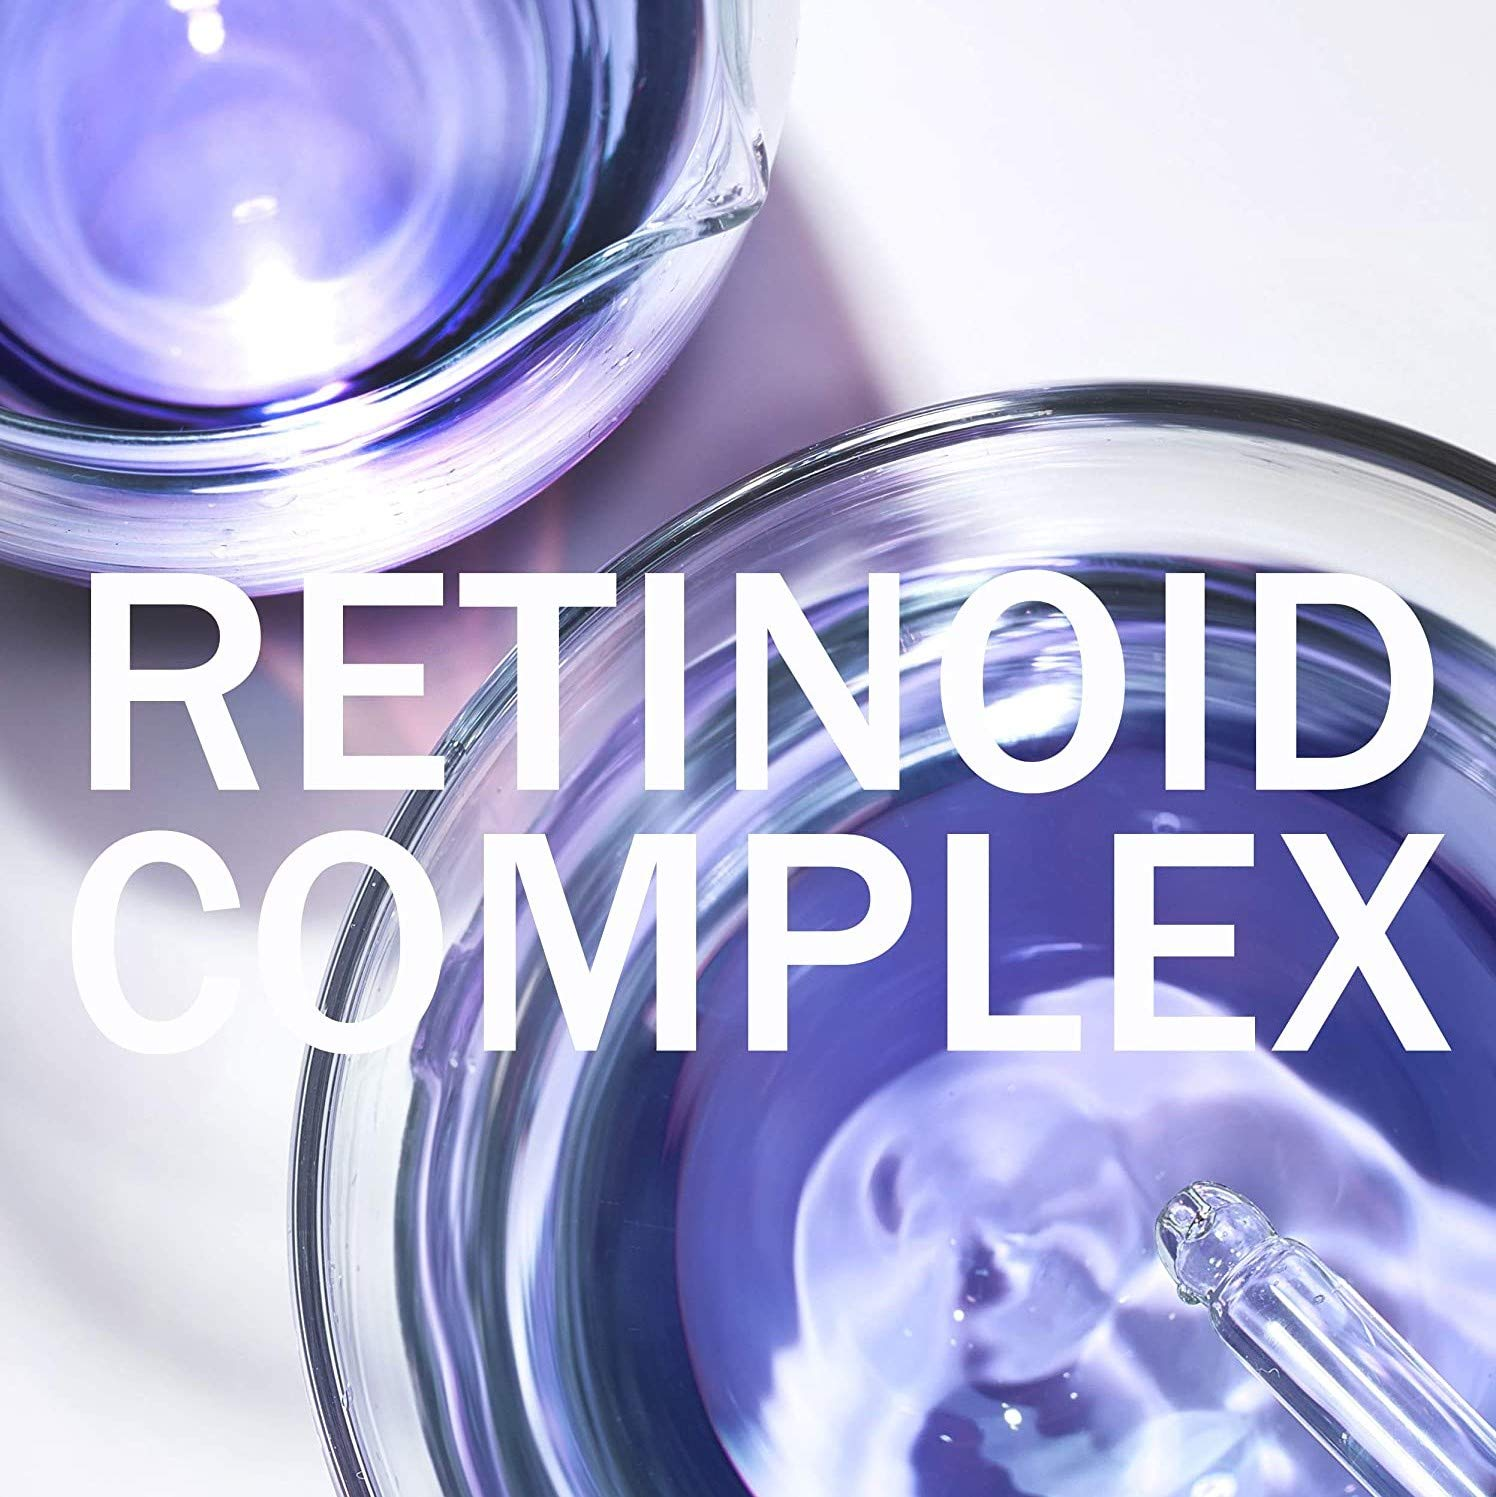 Olay Regenerist Retinol Moisturizer, Retinol 24 Night Face Cream, 1.7oz + Whip Face Moisturizer Travel/Trial Size Bundle: Beauty